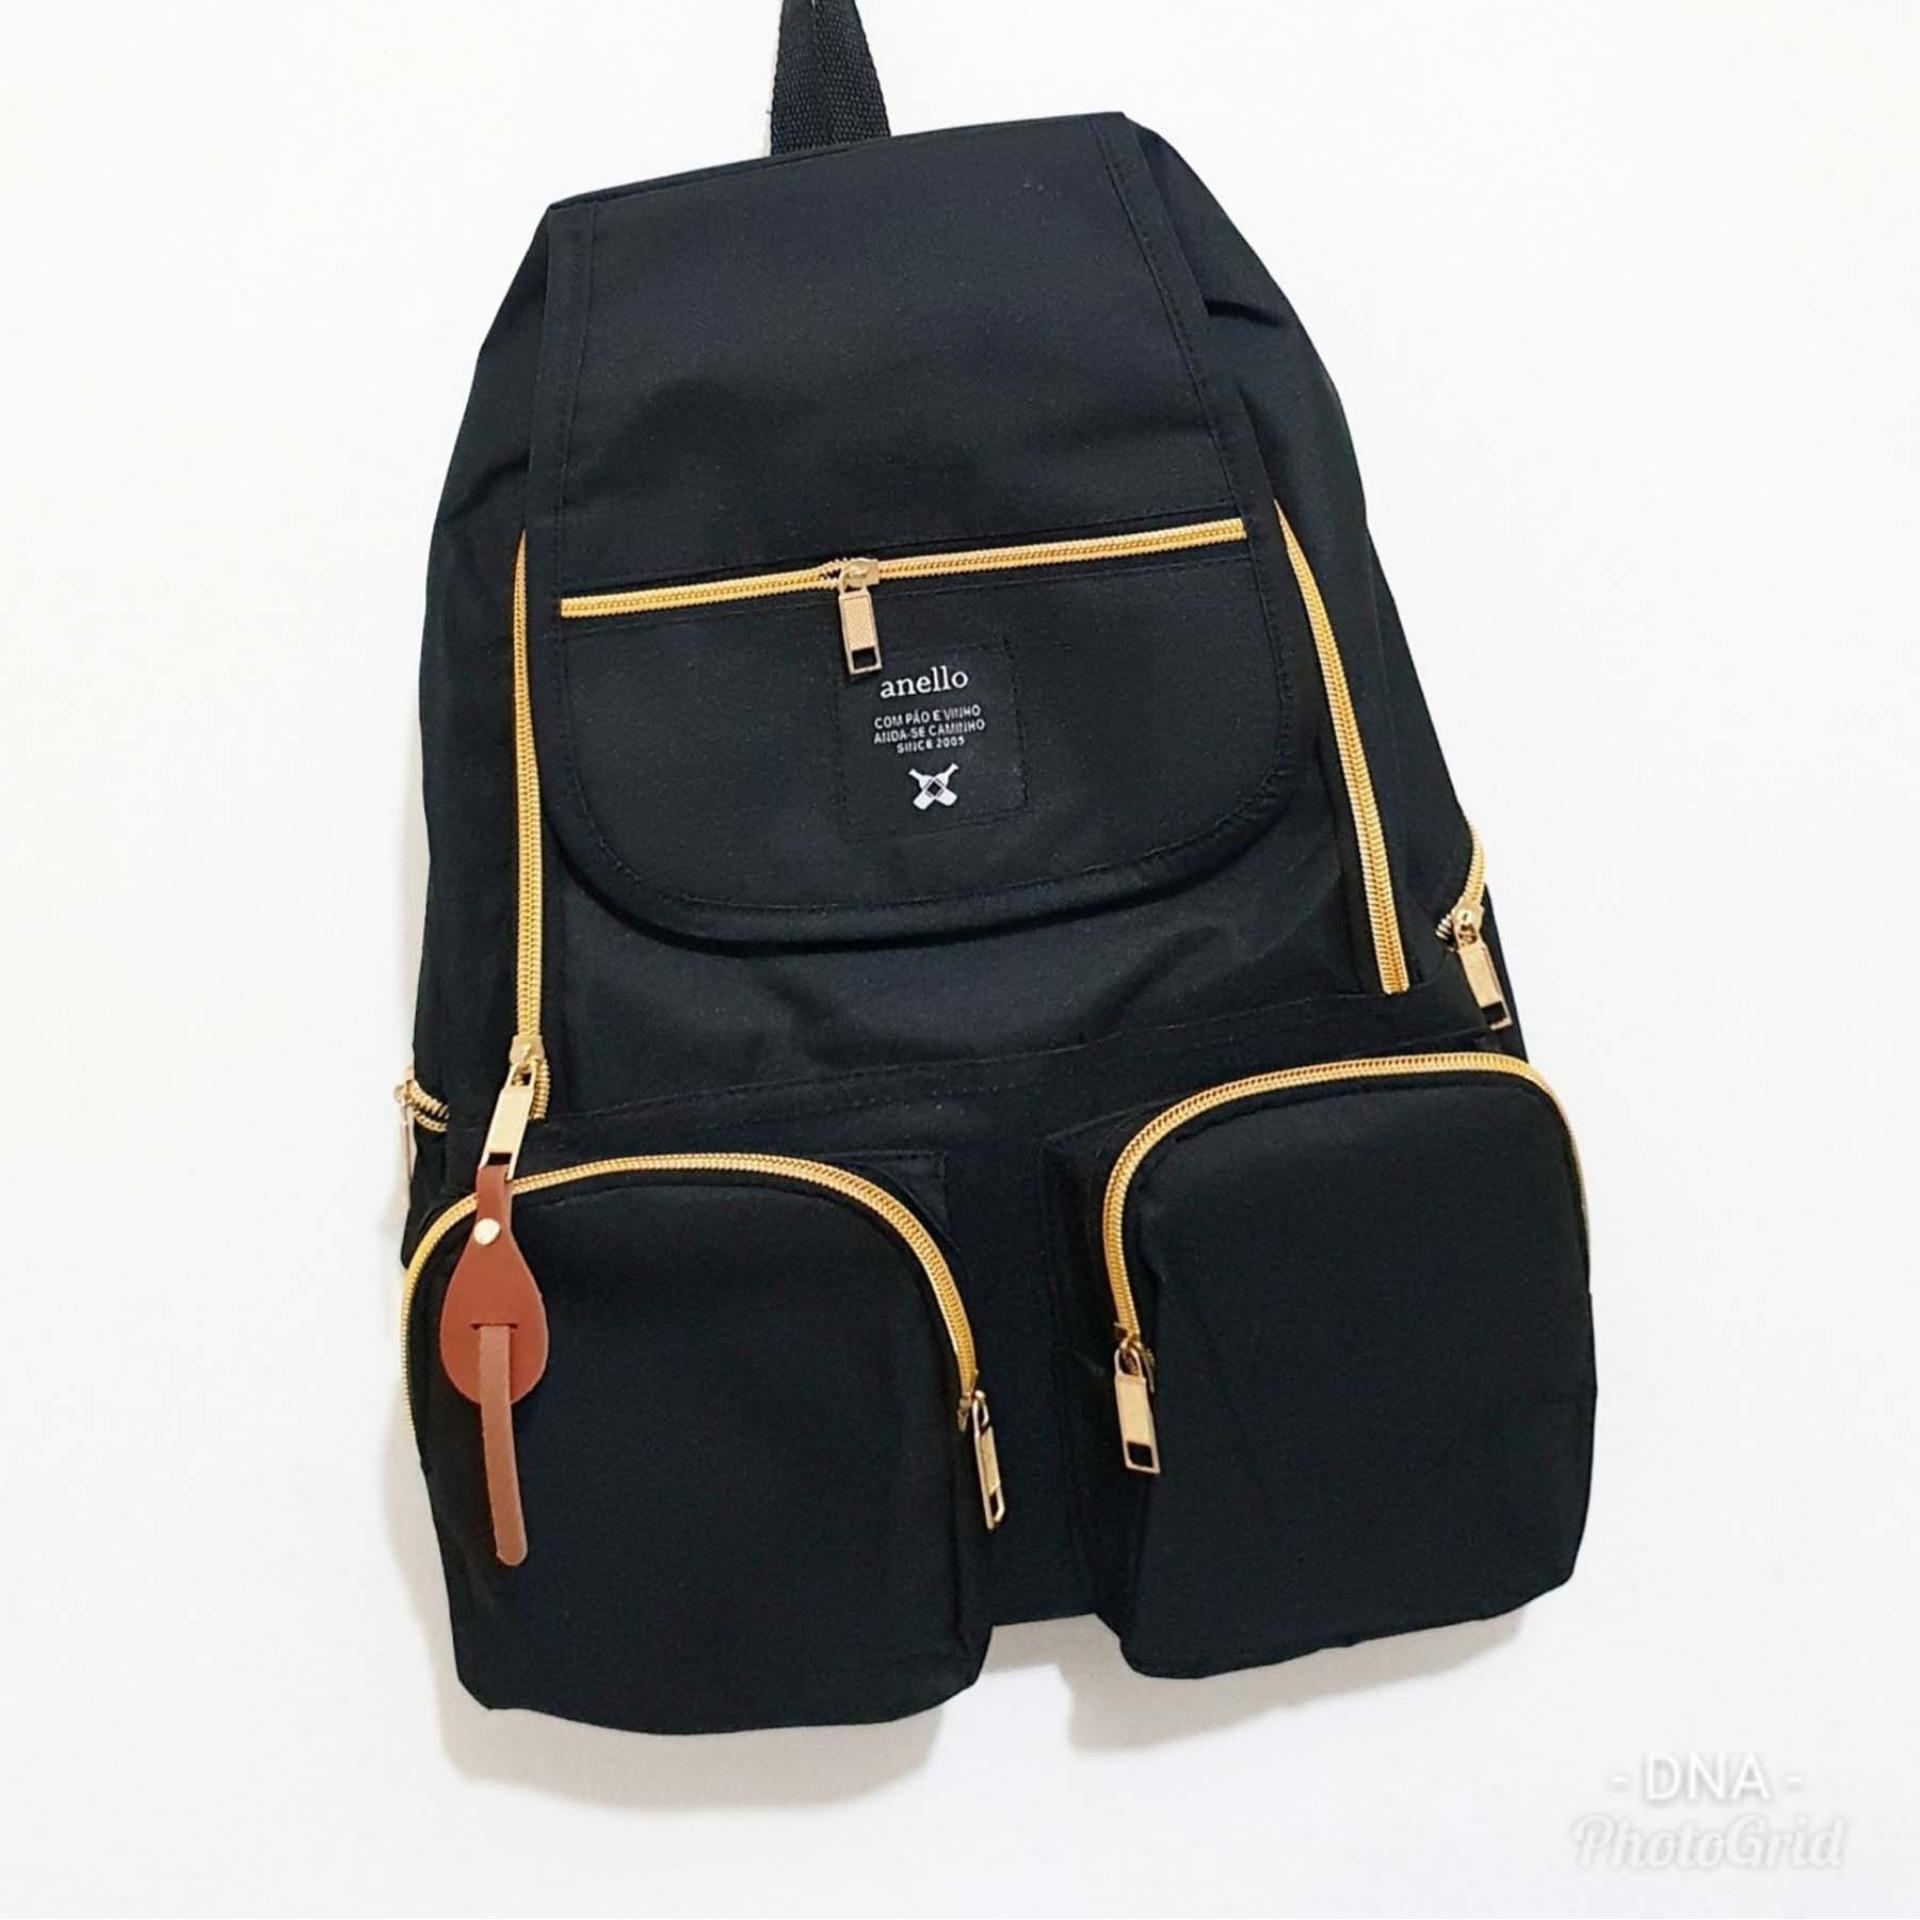 Amaryllis Backpack Korean Style Anello Pocket / Tas Ransel Wanita / Tas Ransel Pria / Tas